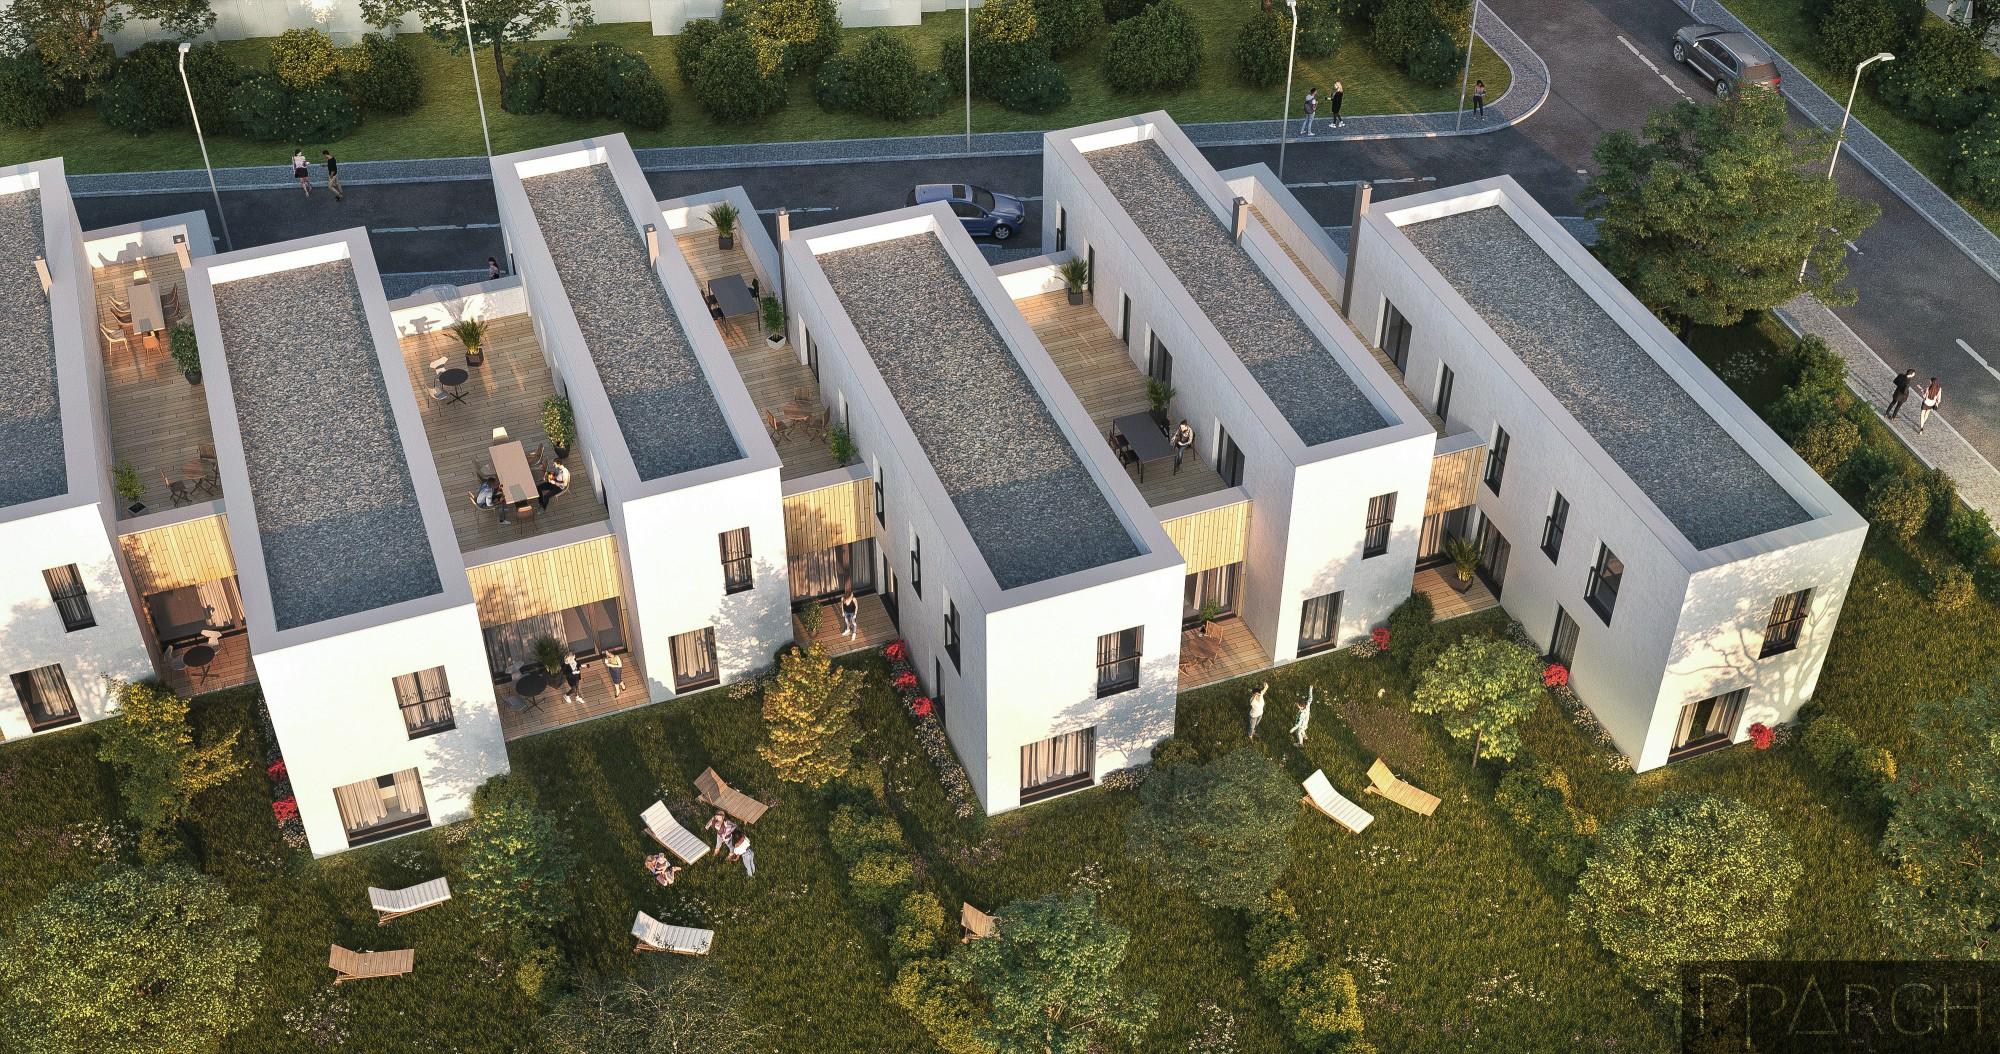 01-Krivan-rezidencne-radovy-dom-developersky-projekt-exterier-vizualizacia-optim